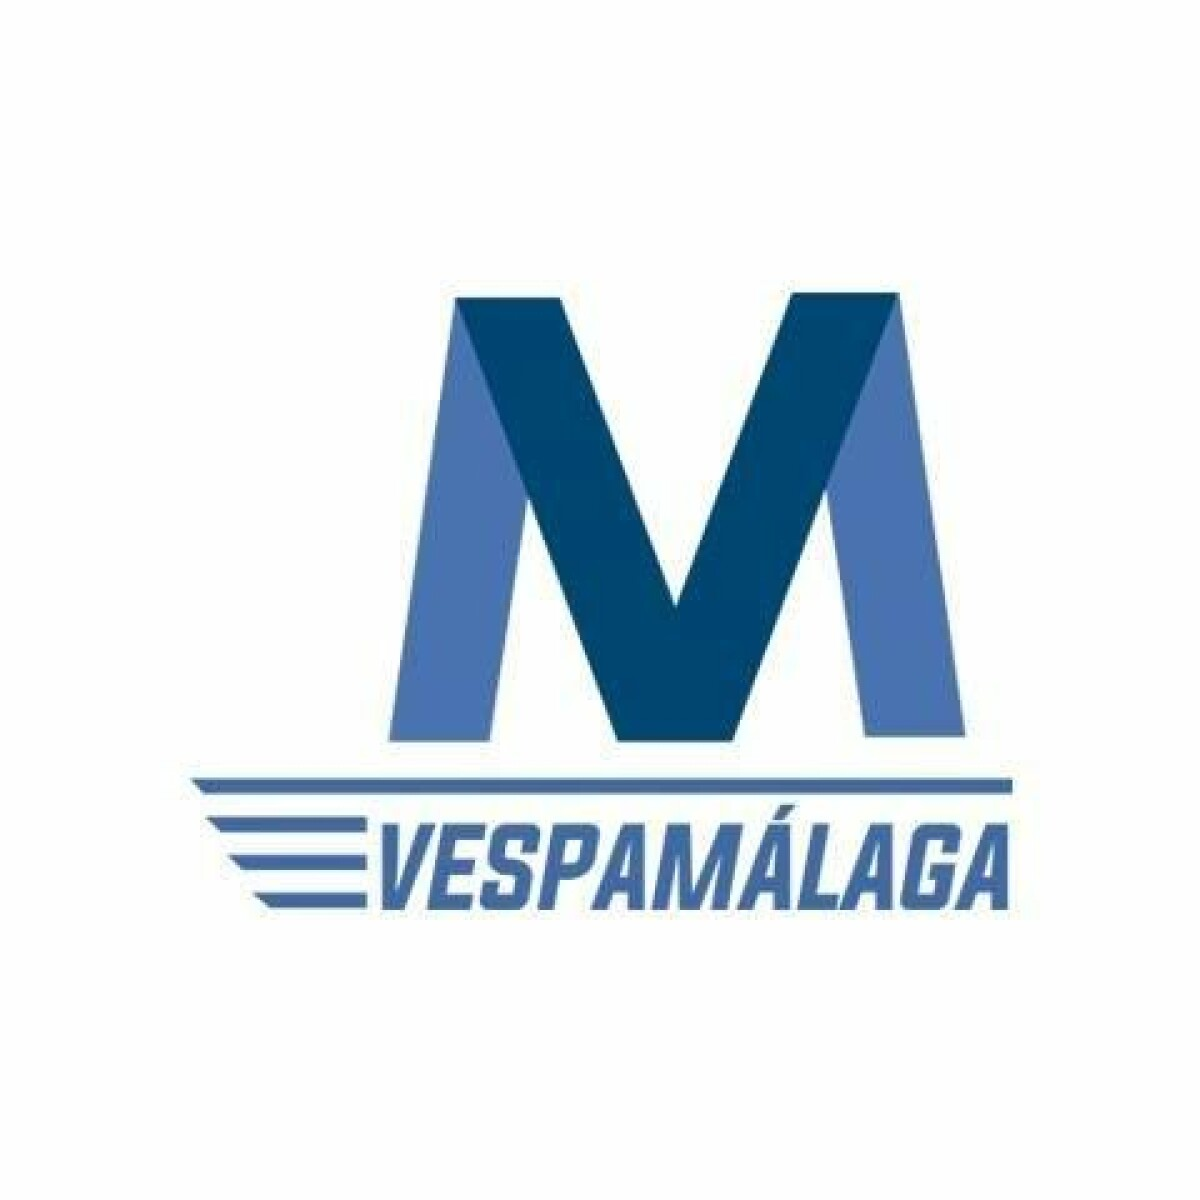 Vespamálaga